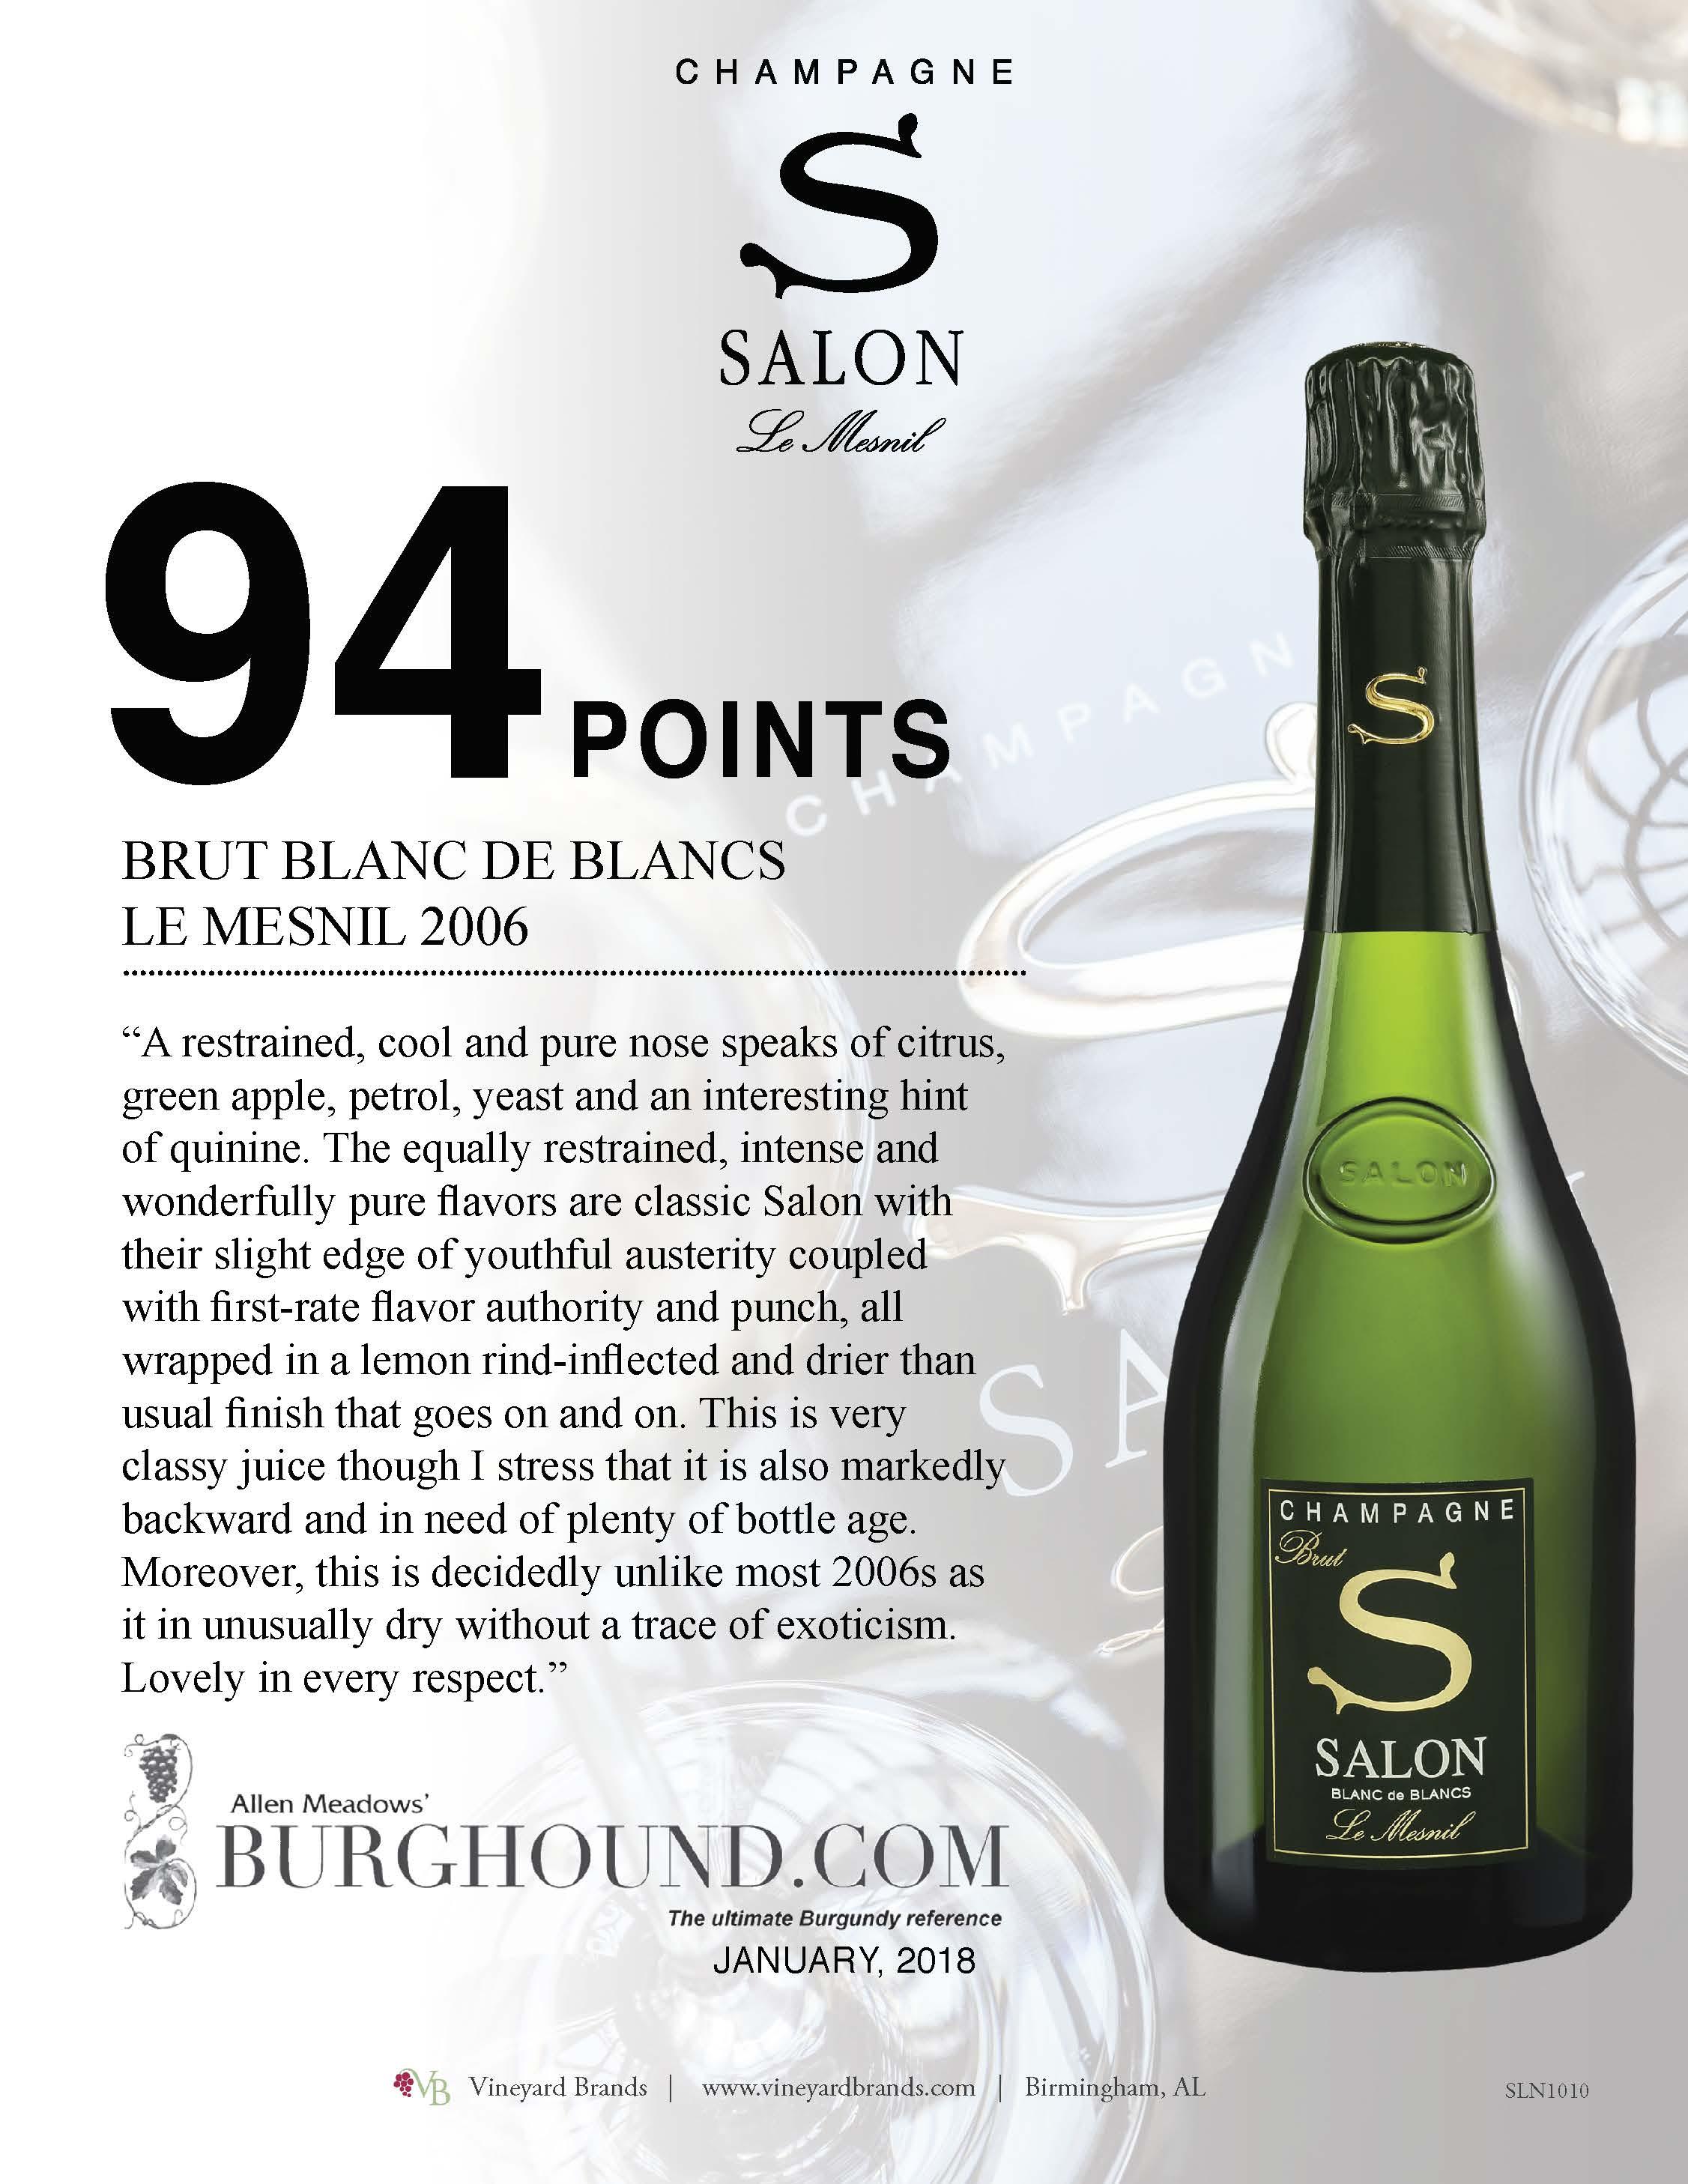 Champagne Salon Brut Blanc de Blancs 2006.jpg